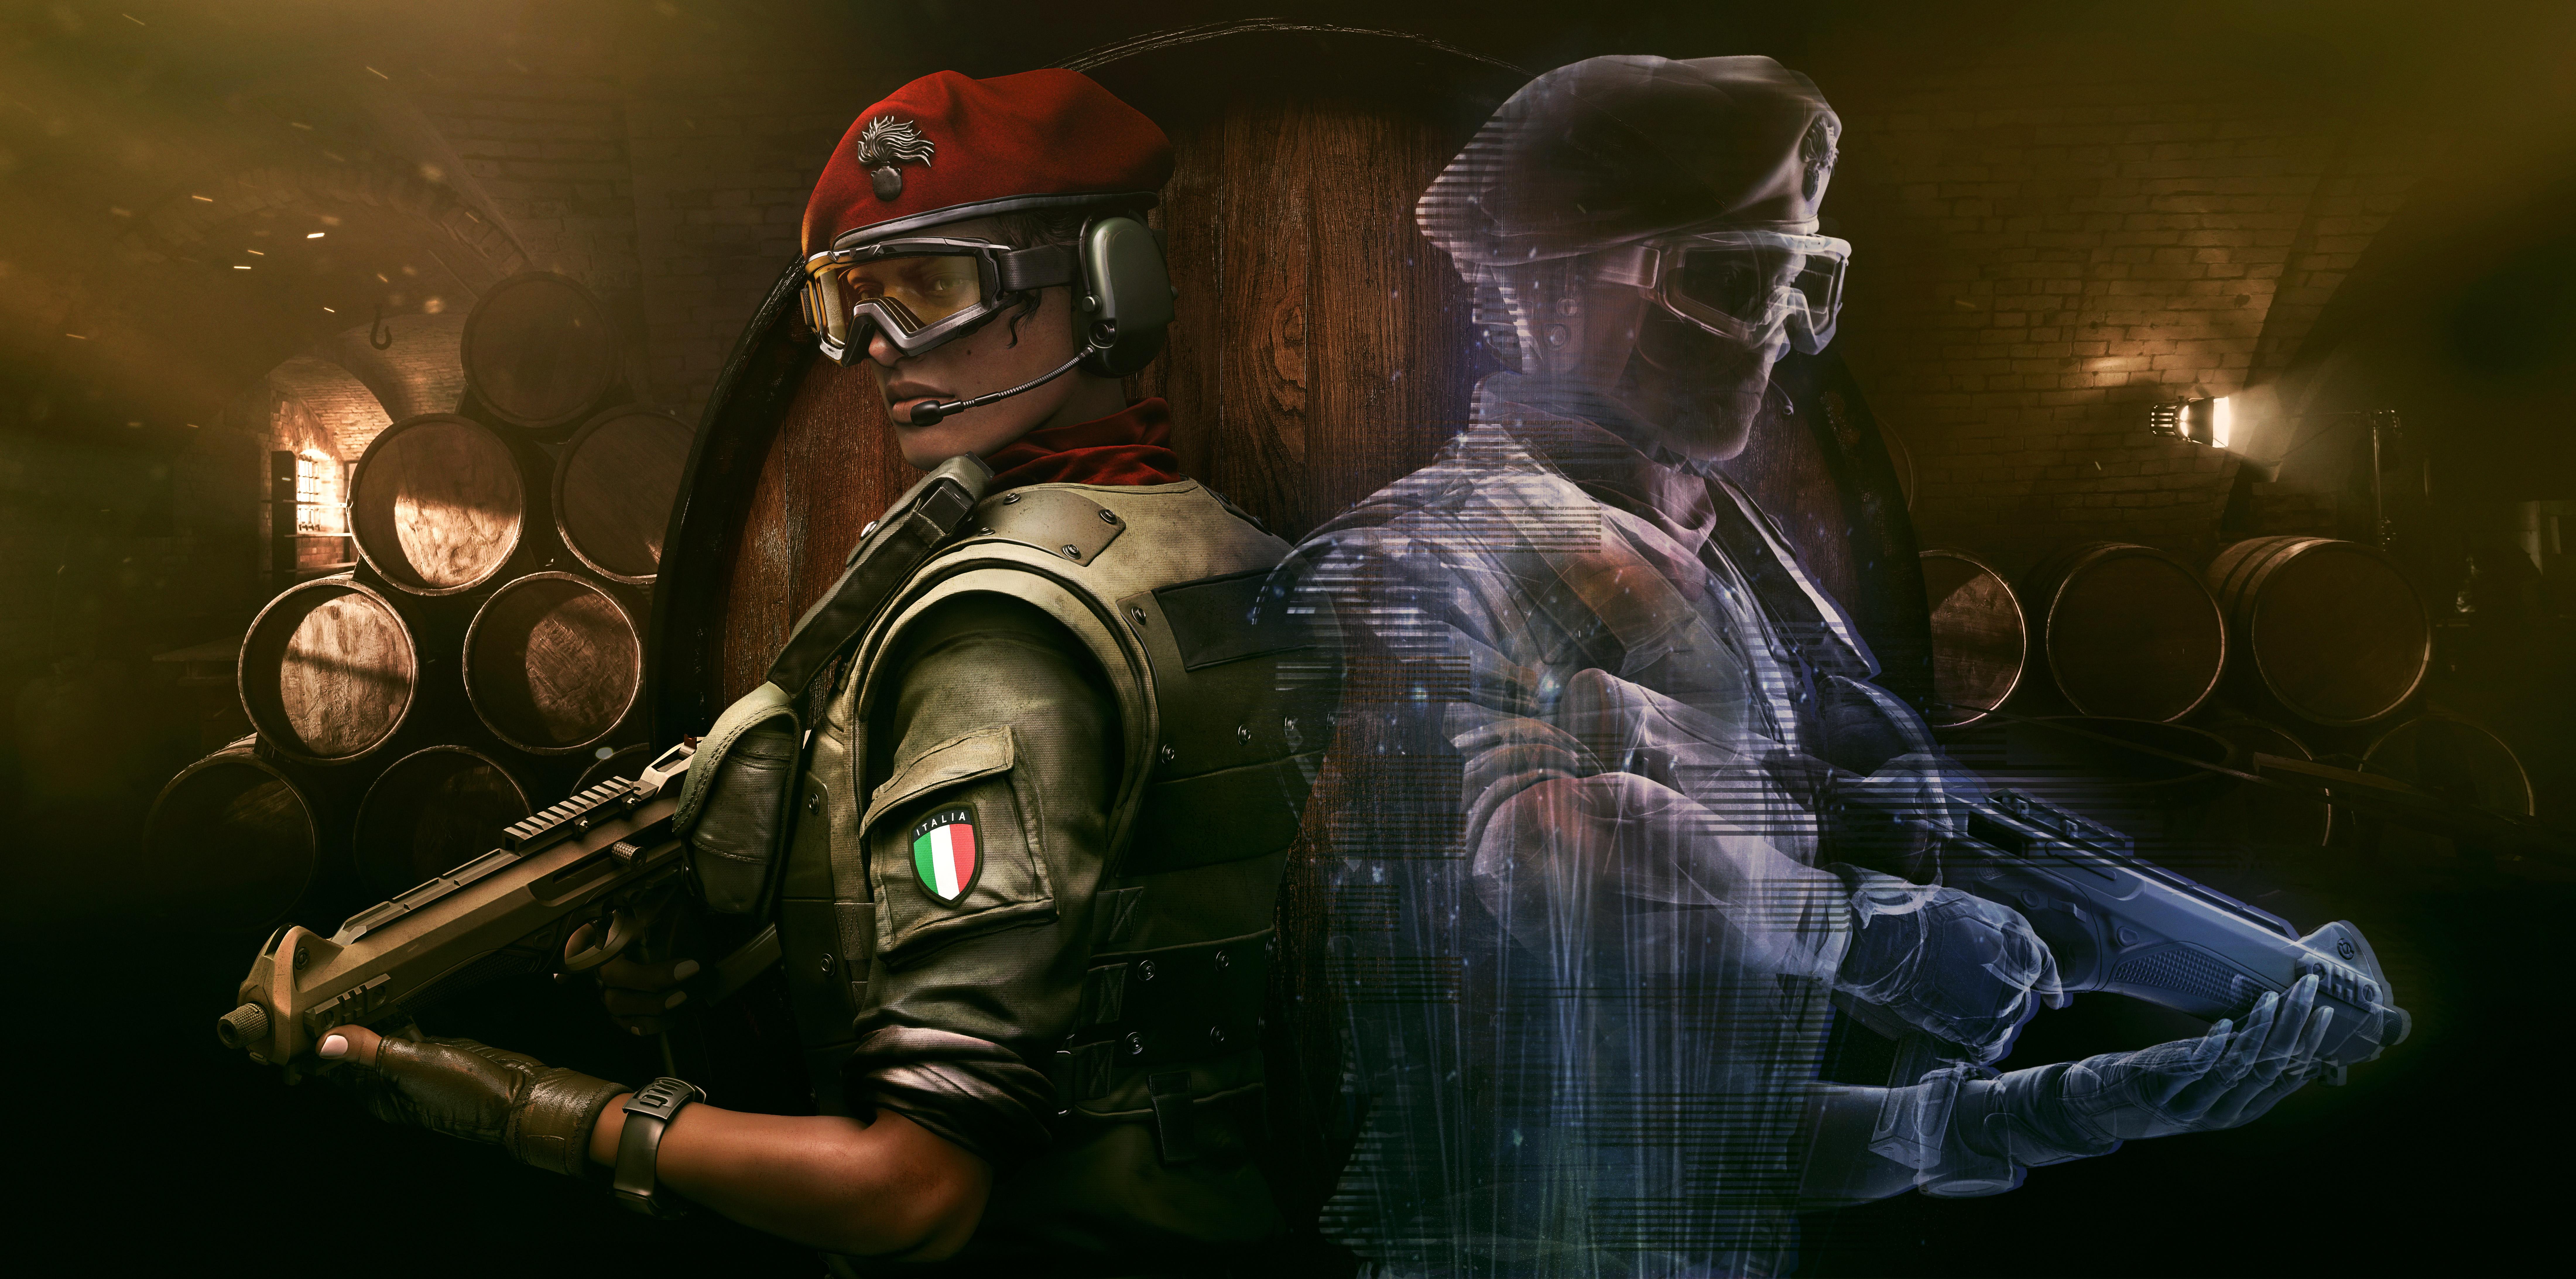 Frost Tom Clancys Rainbow Six Siege 5k, HD Games, 4k